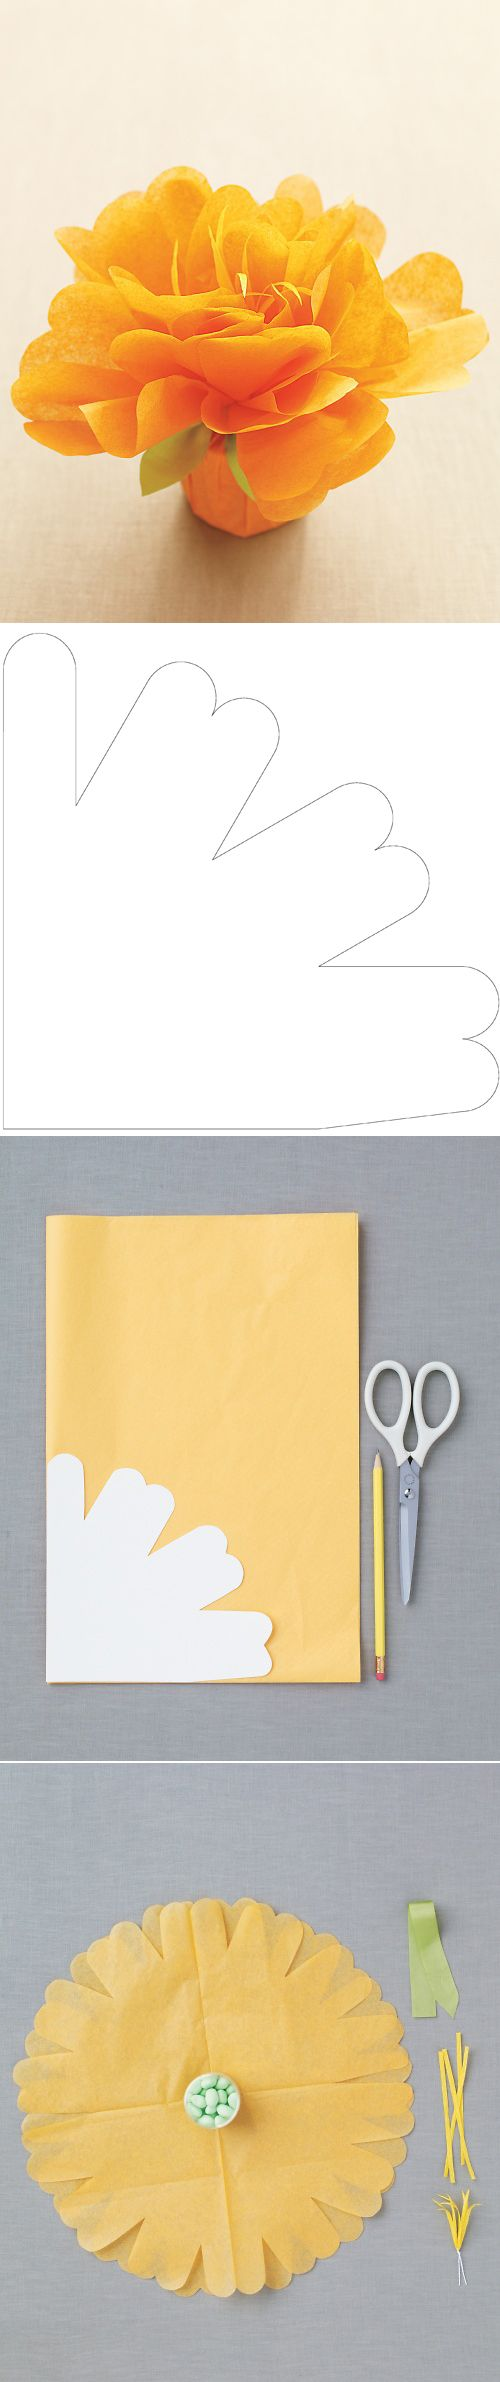 Tissue Paper Flower Favors Template Kids Party Ideas Pinterest